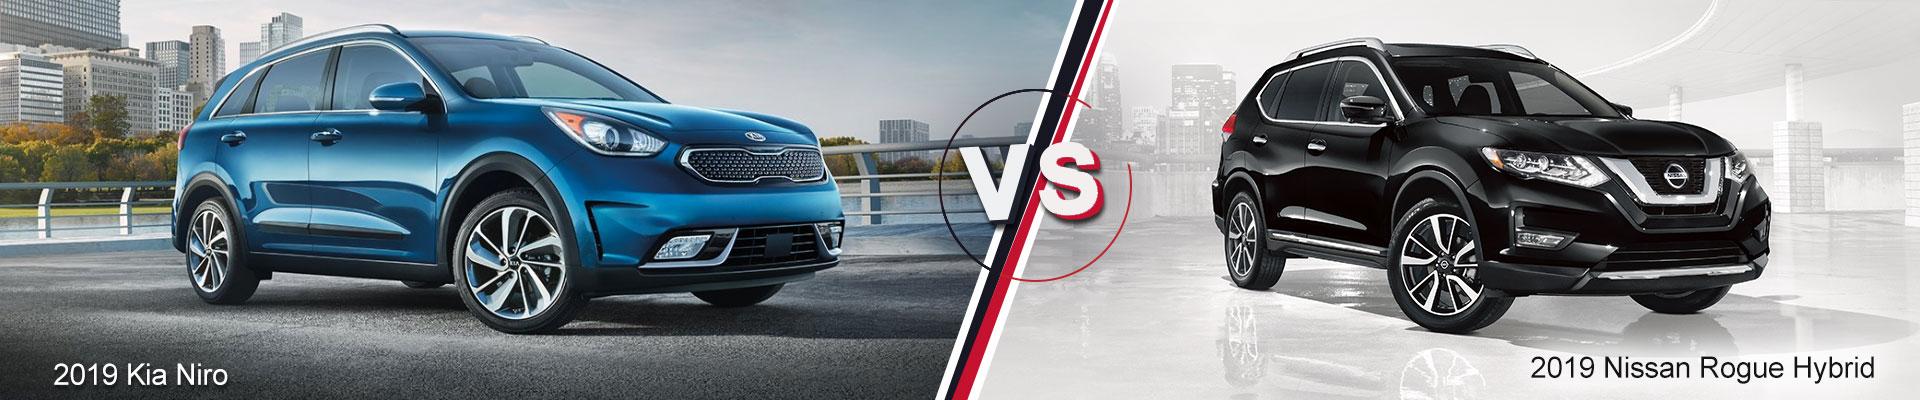 2019 Kia Niro VS. 2019 Nissan Rogue Hybrid Kia of Duluth